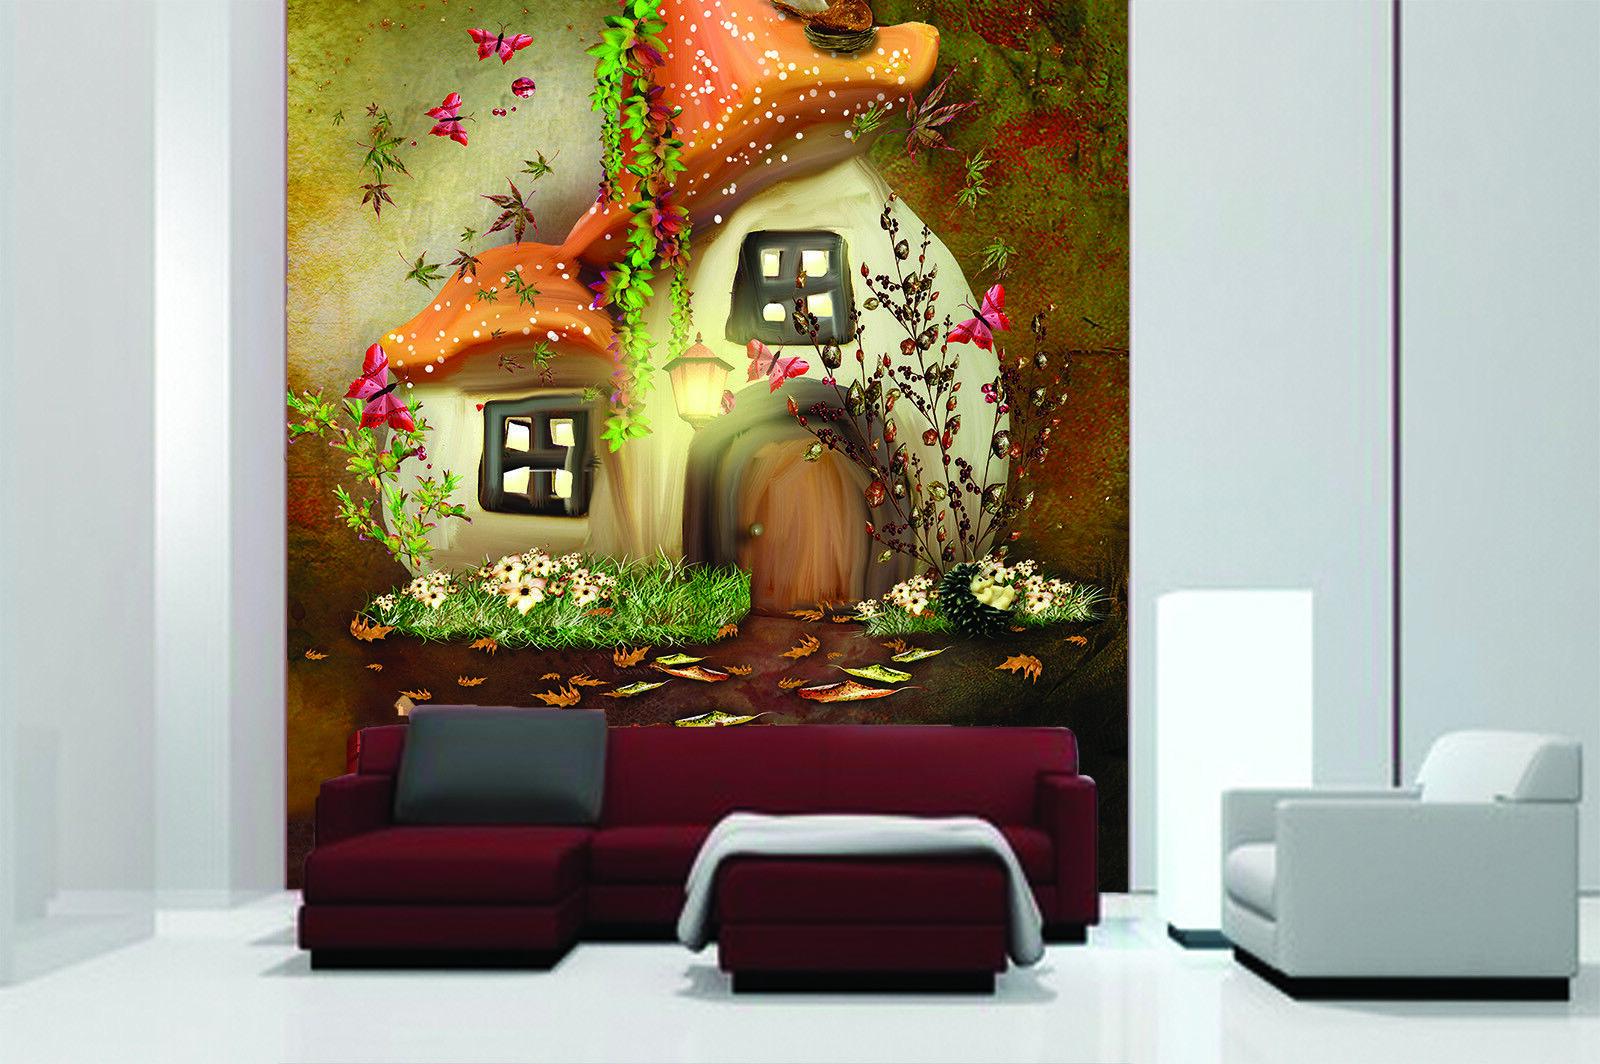 3D Anime House 409 Wallpaper Murals Wall Print Wallpaper Mural AJ WALL AU Kyra